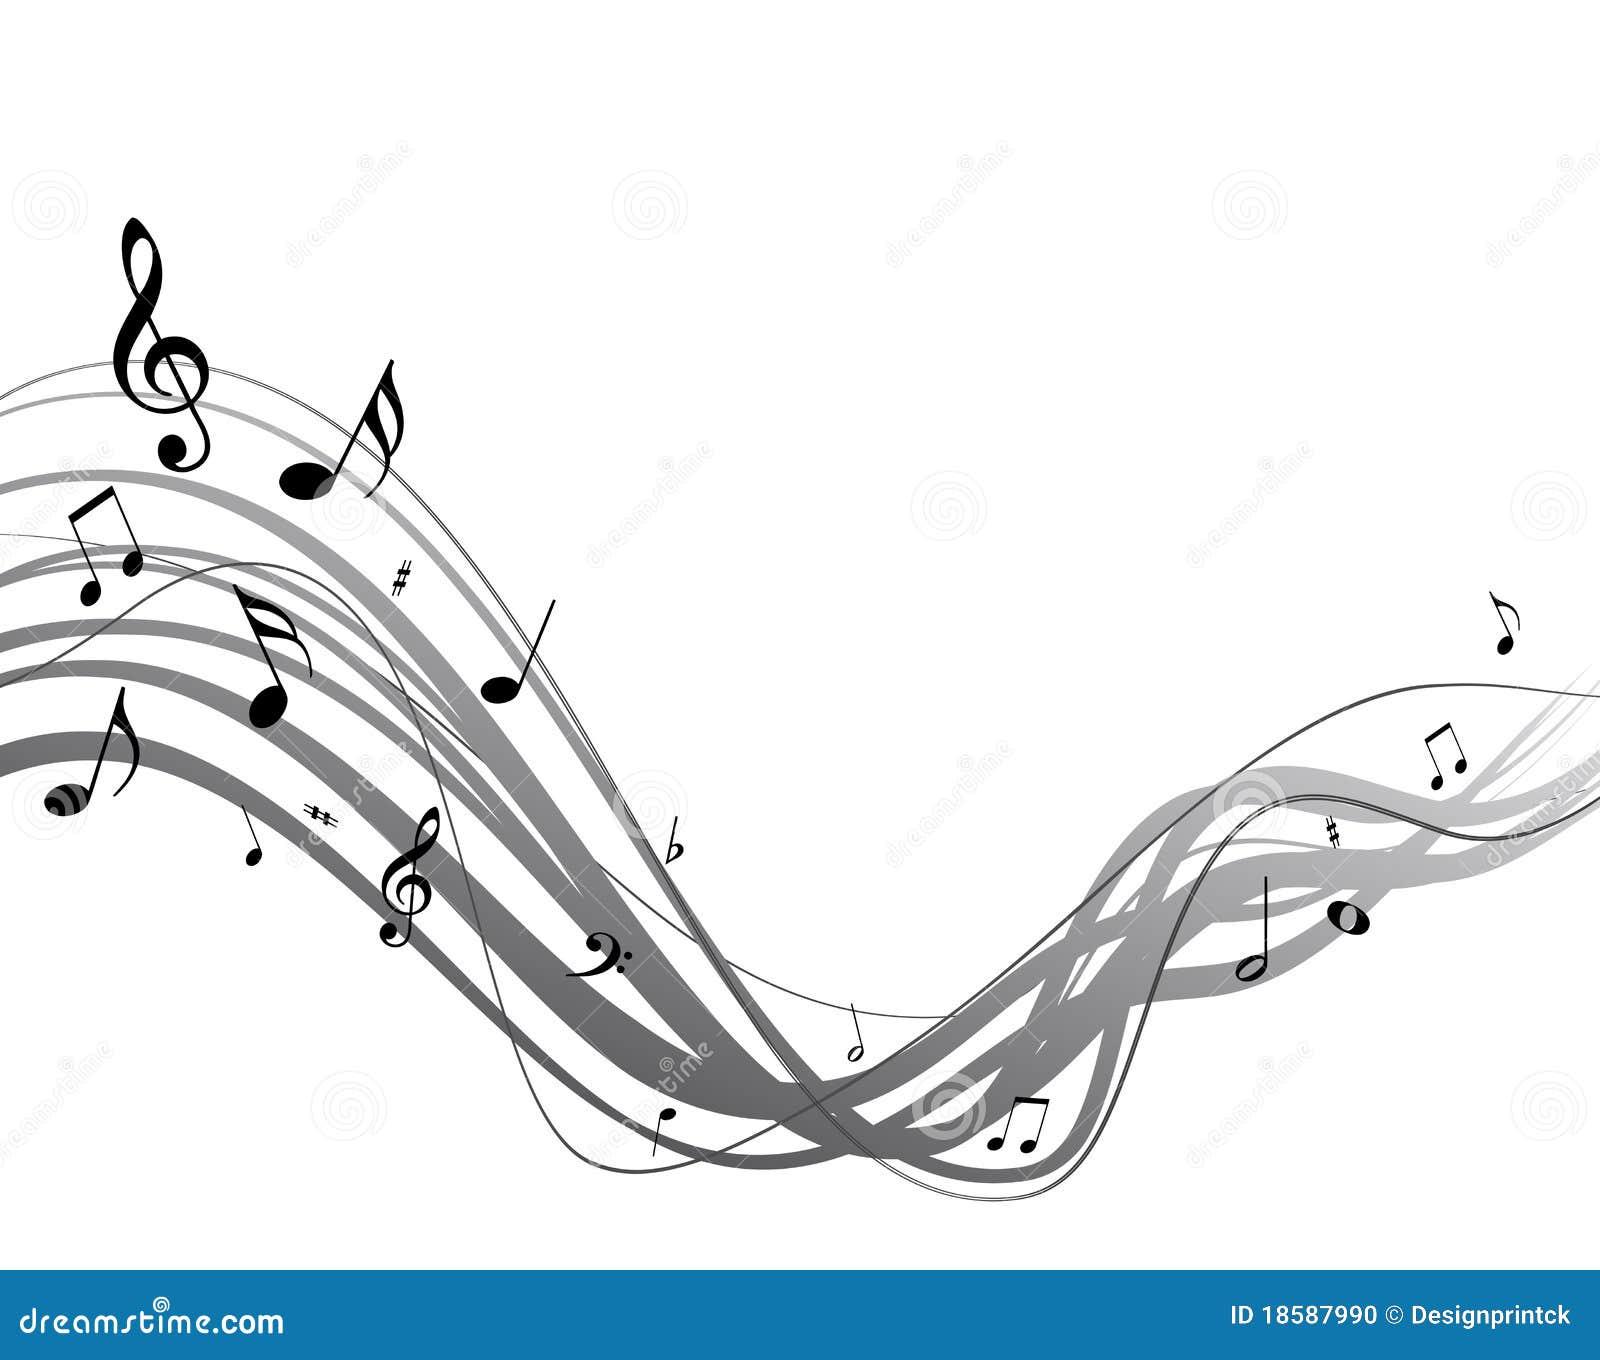 vector music stream stock photo image 18587990 vector music notes free download vector music notes logo